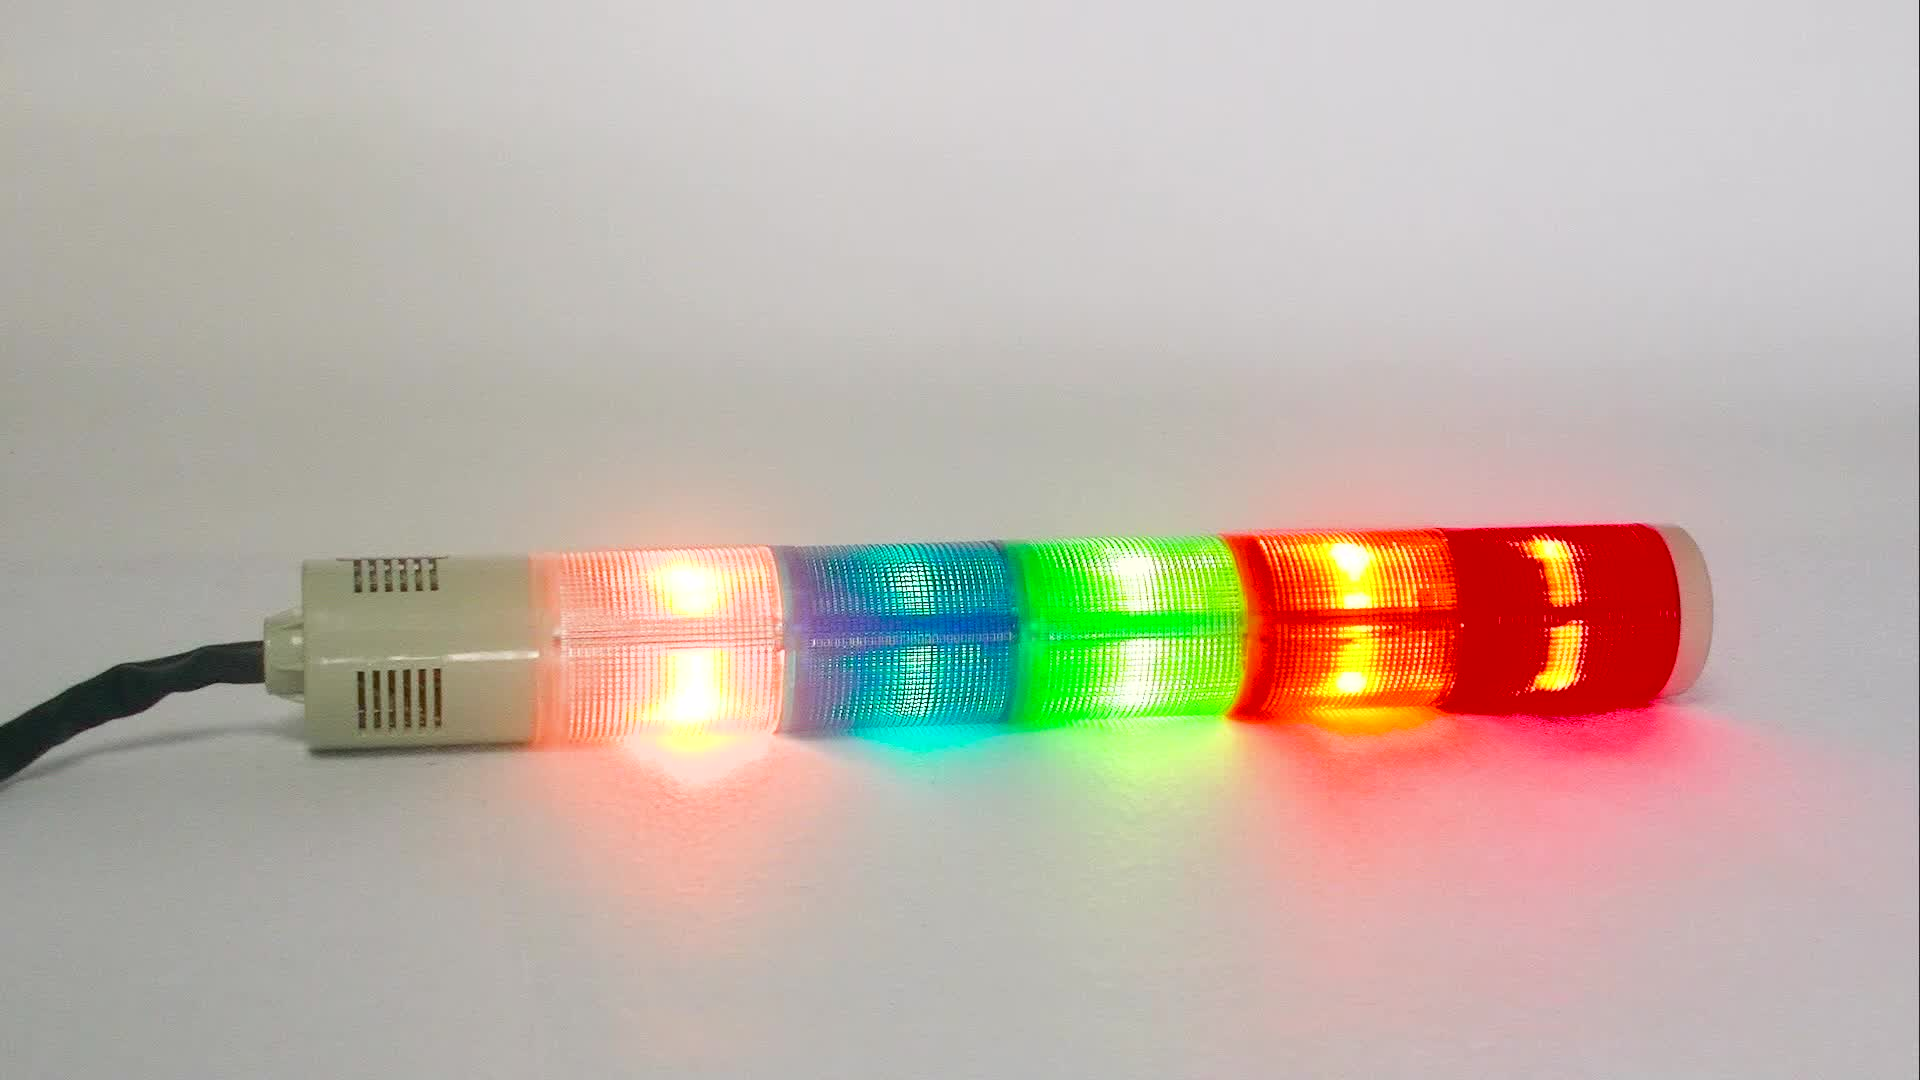 LTA-205J-3 Multi layer tower light Indicator light with sound